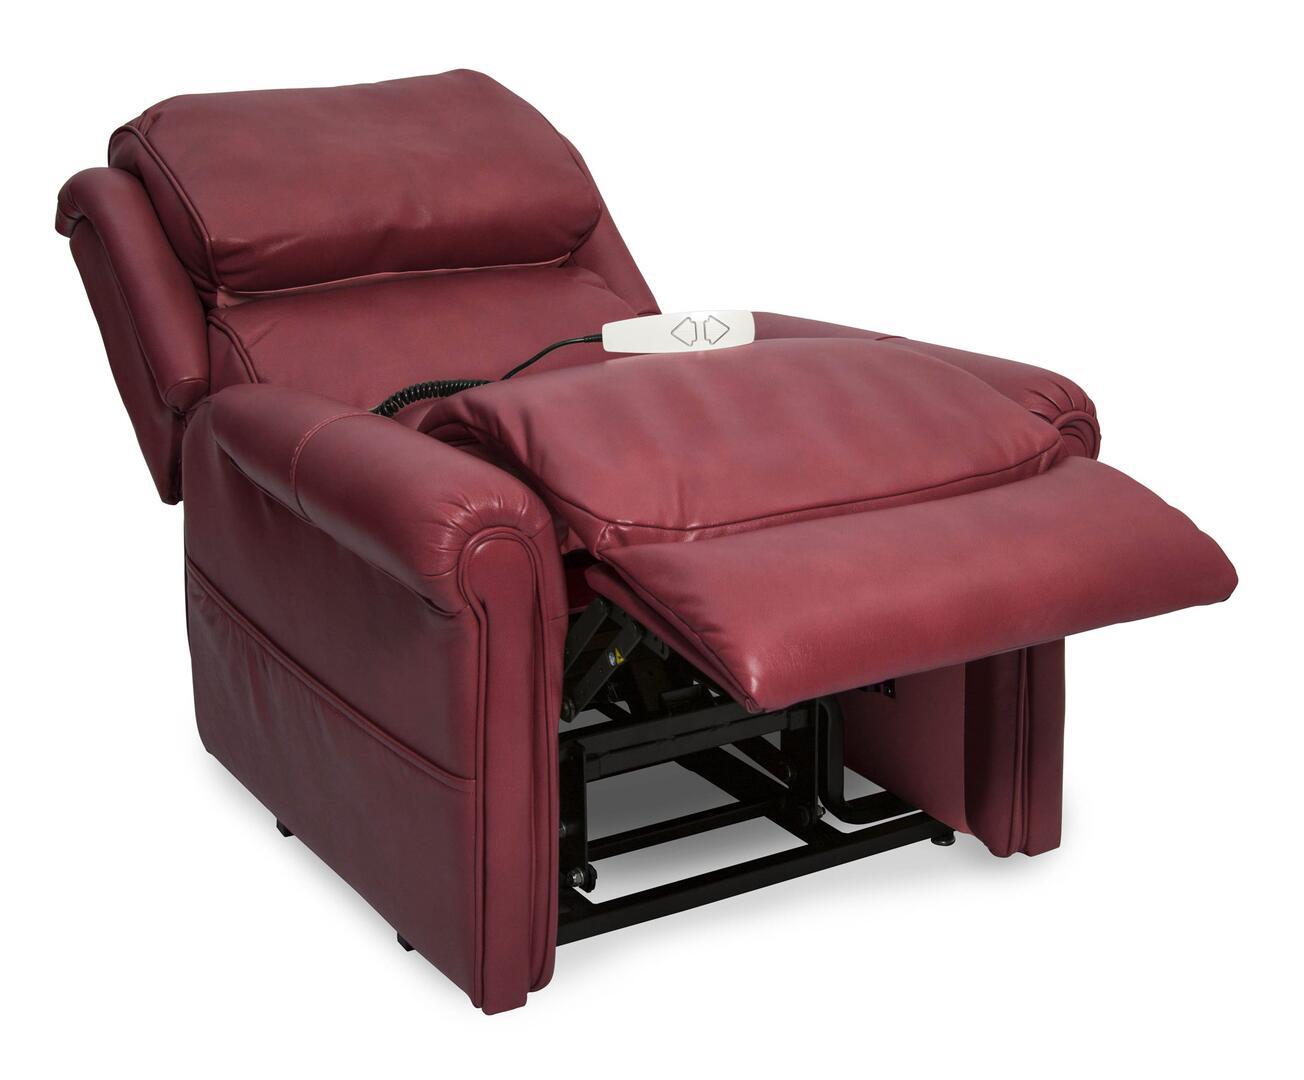 mega motion lift chair customer service x rocker power cord nm2350broa0a uptown series contemporary wood